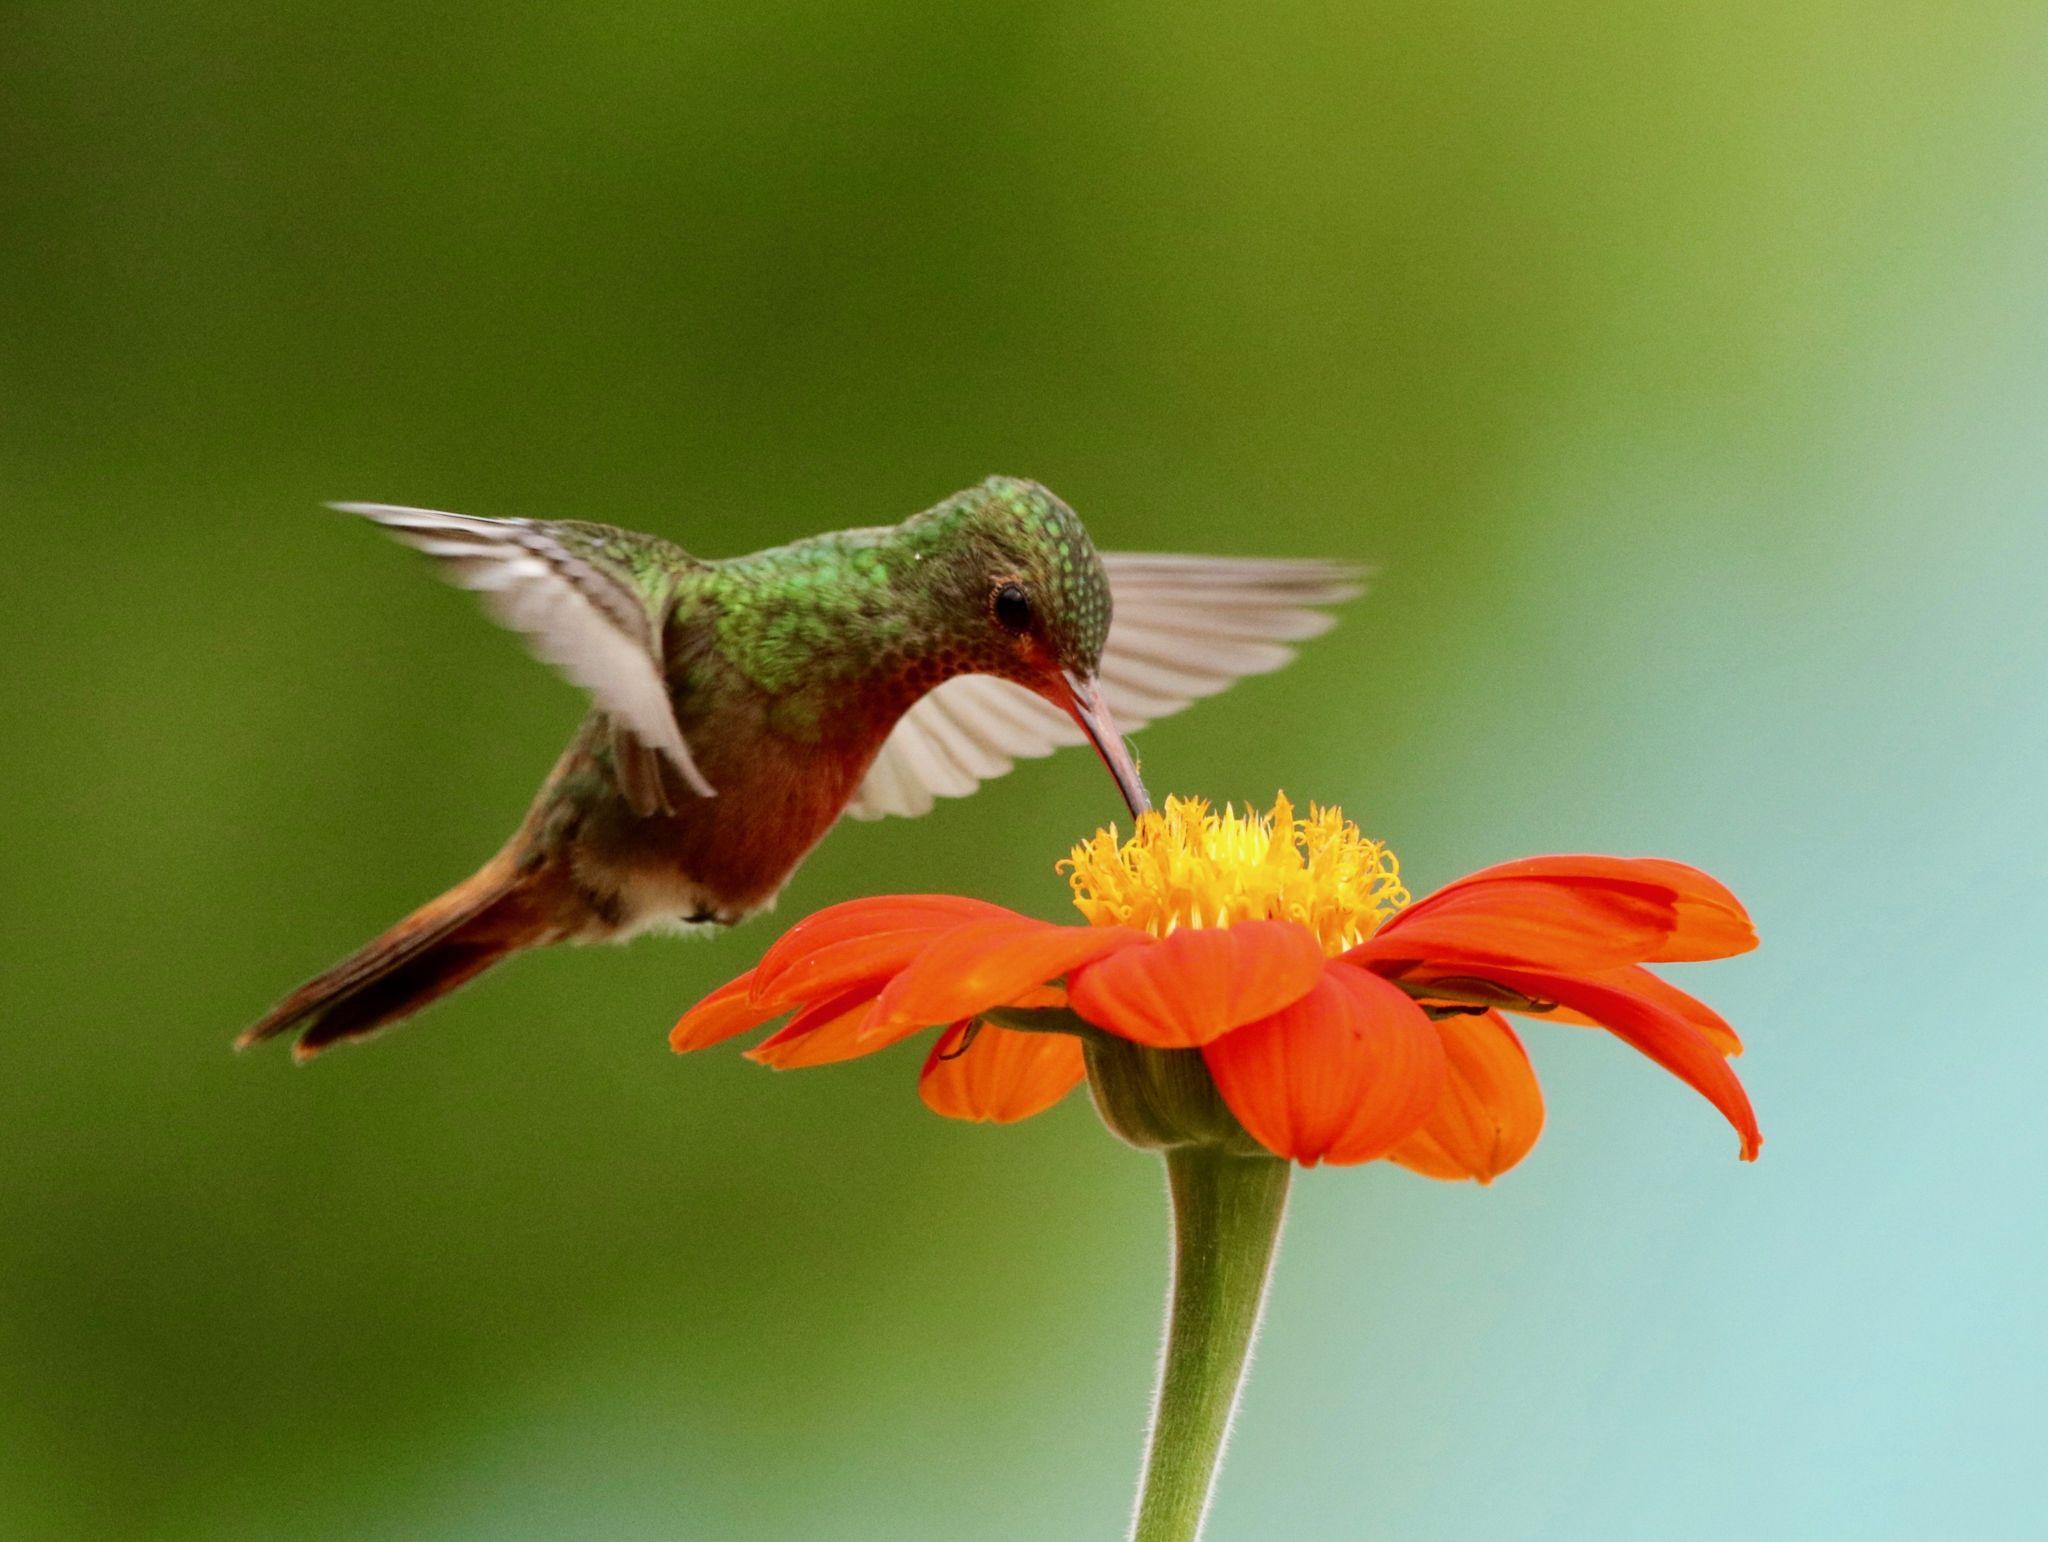 Rufous-tailed Hummingbird, Amazilia tazacatl, feeding on Mexican sunflower.